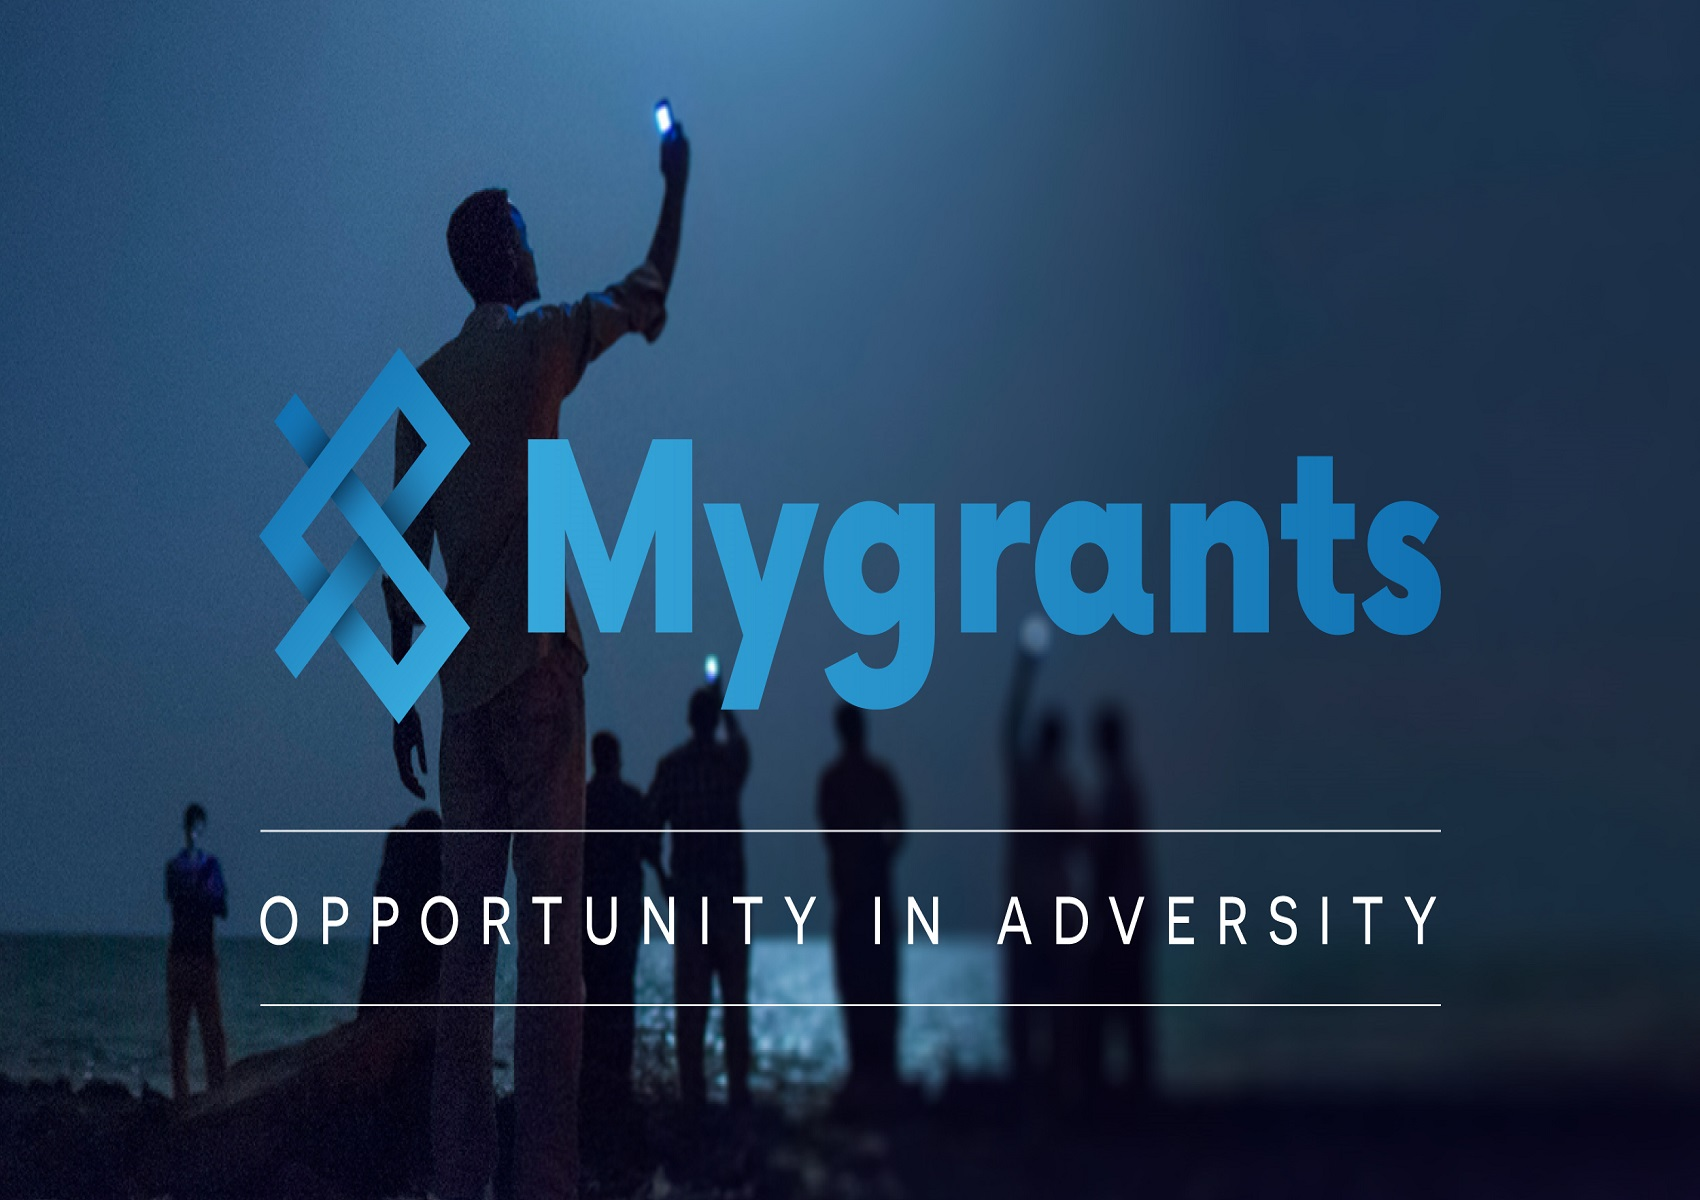 mygrants